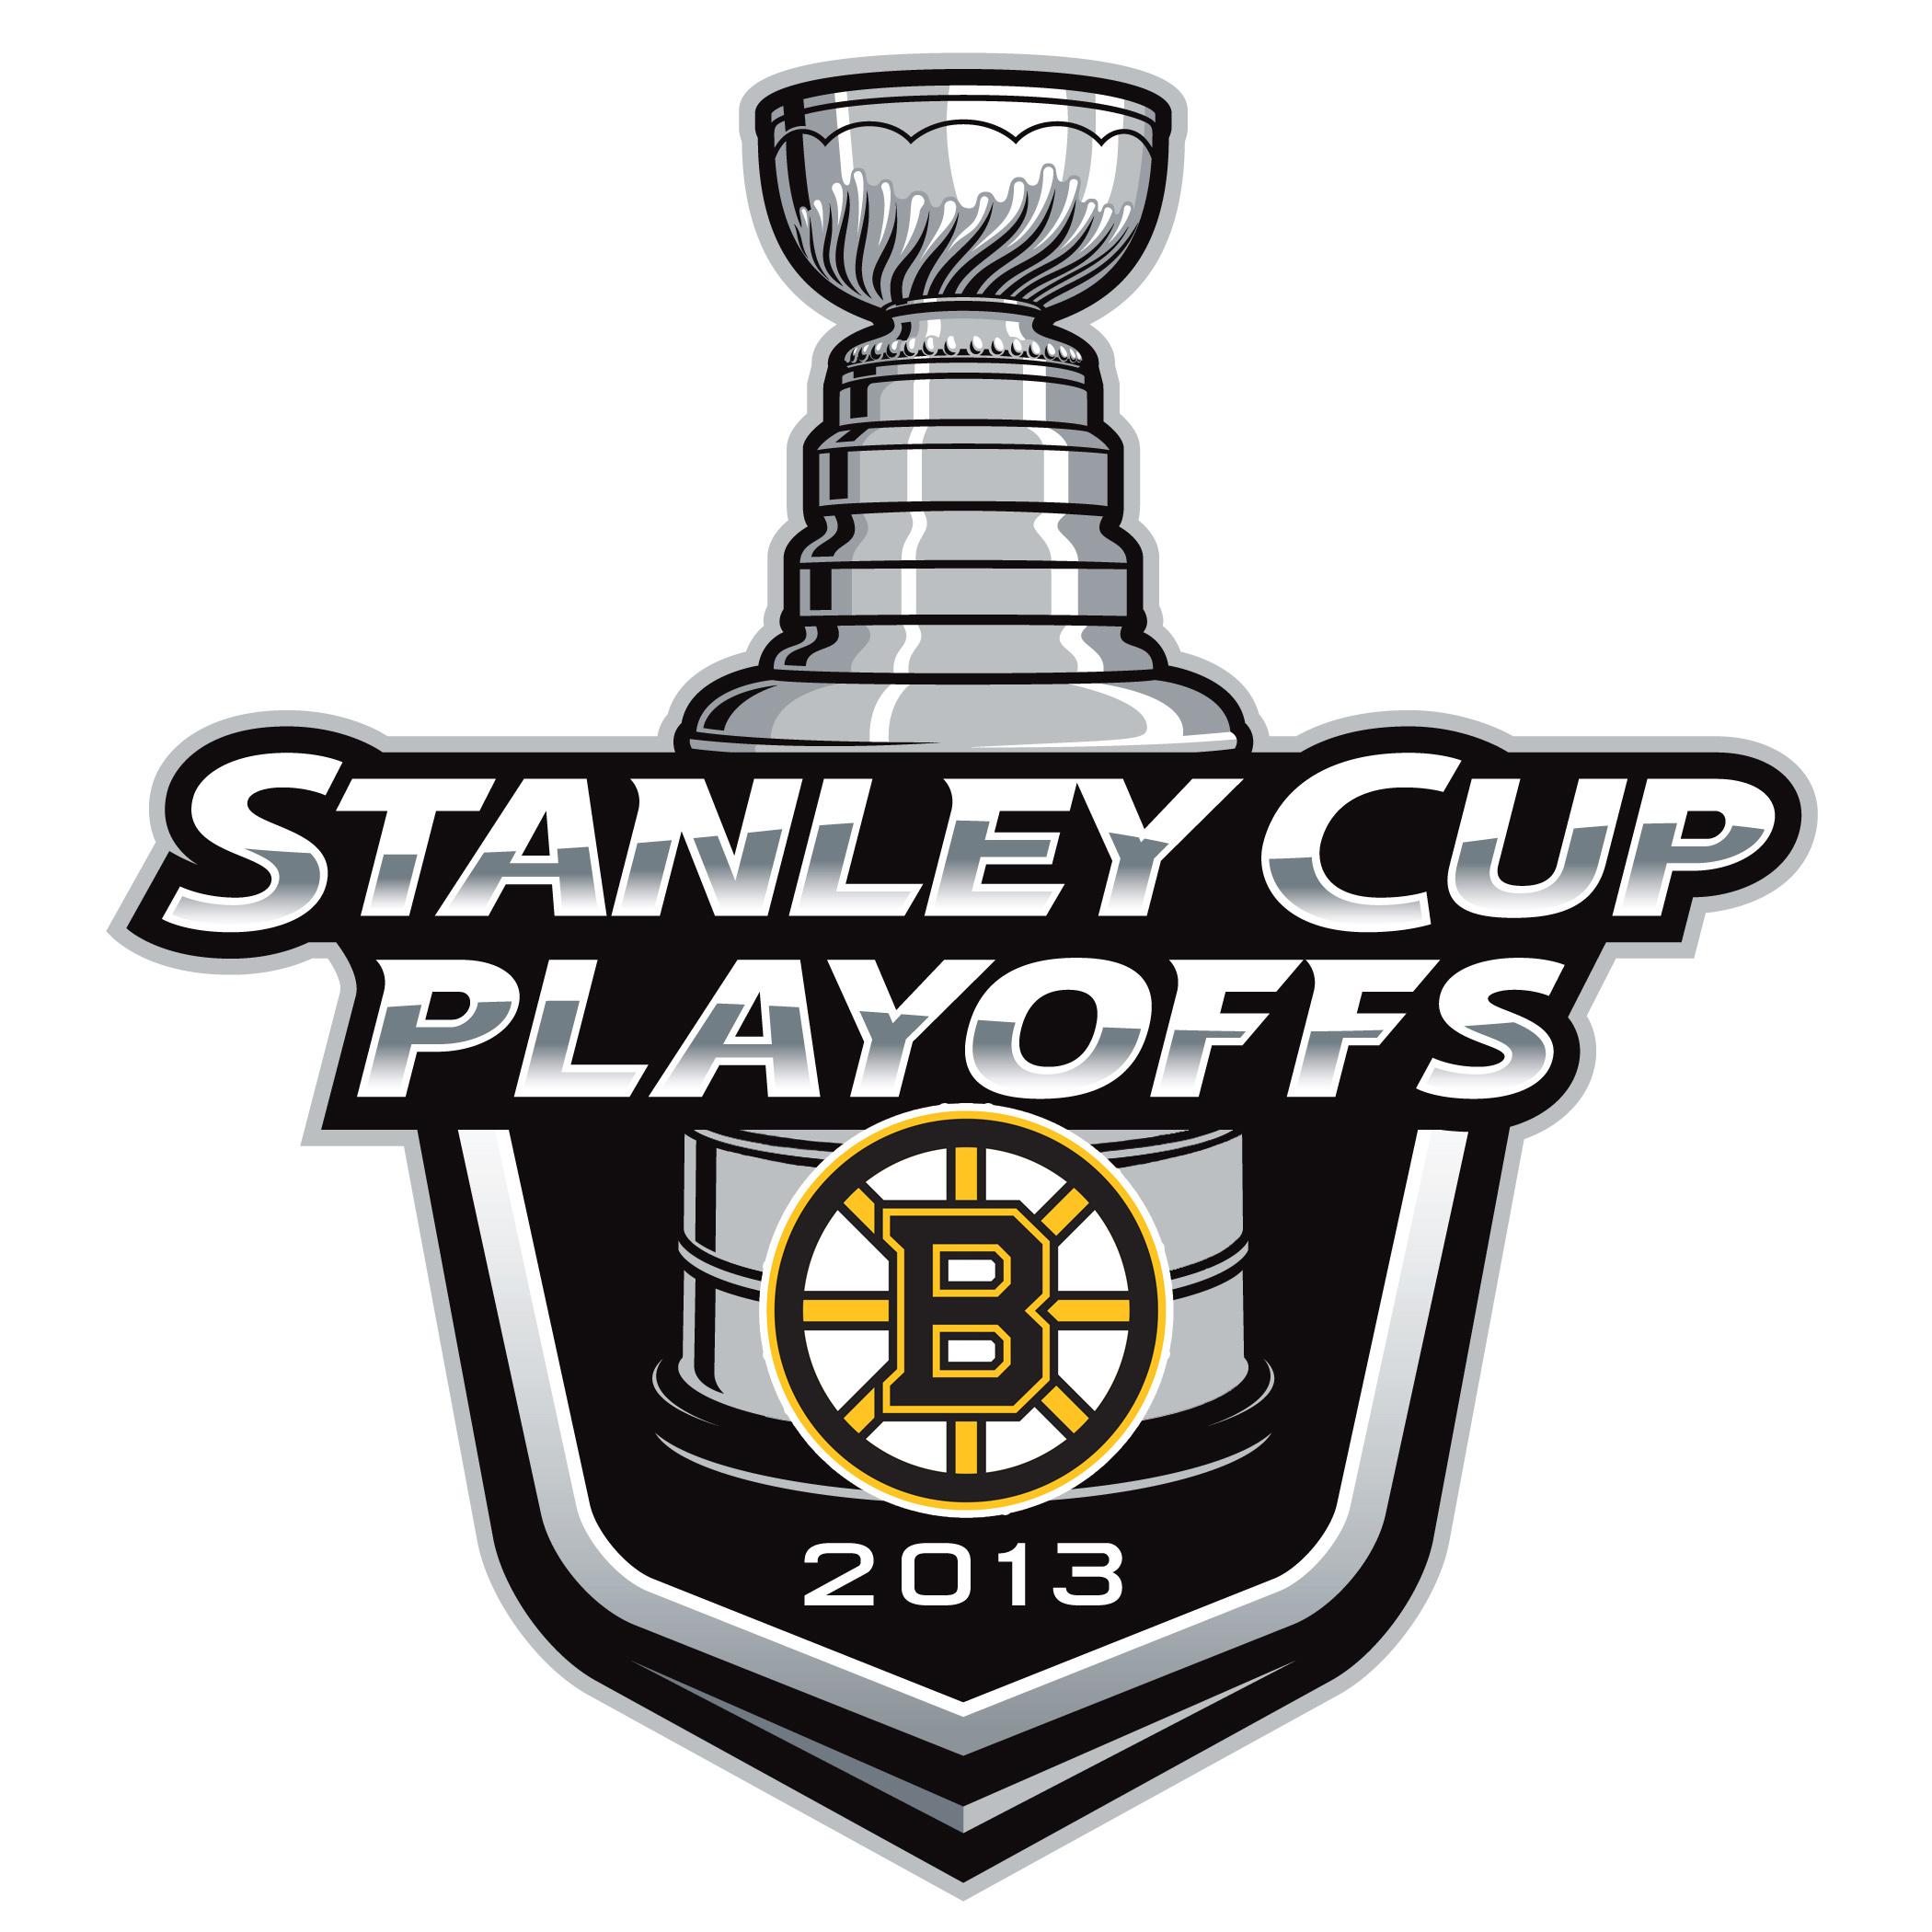 Boston Bruins NHL Playoffs Logo 2013 Decal (Sticker) [STK